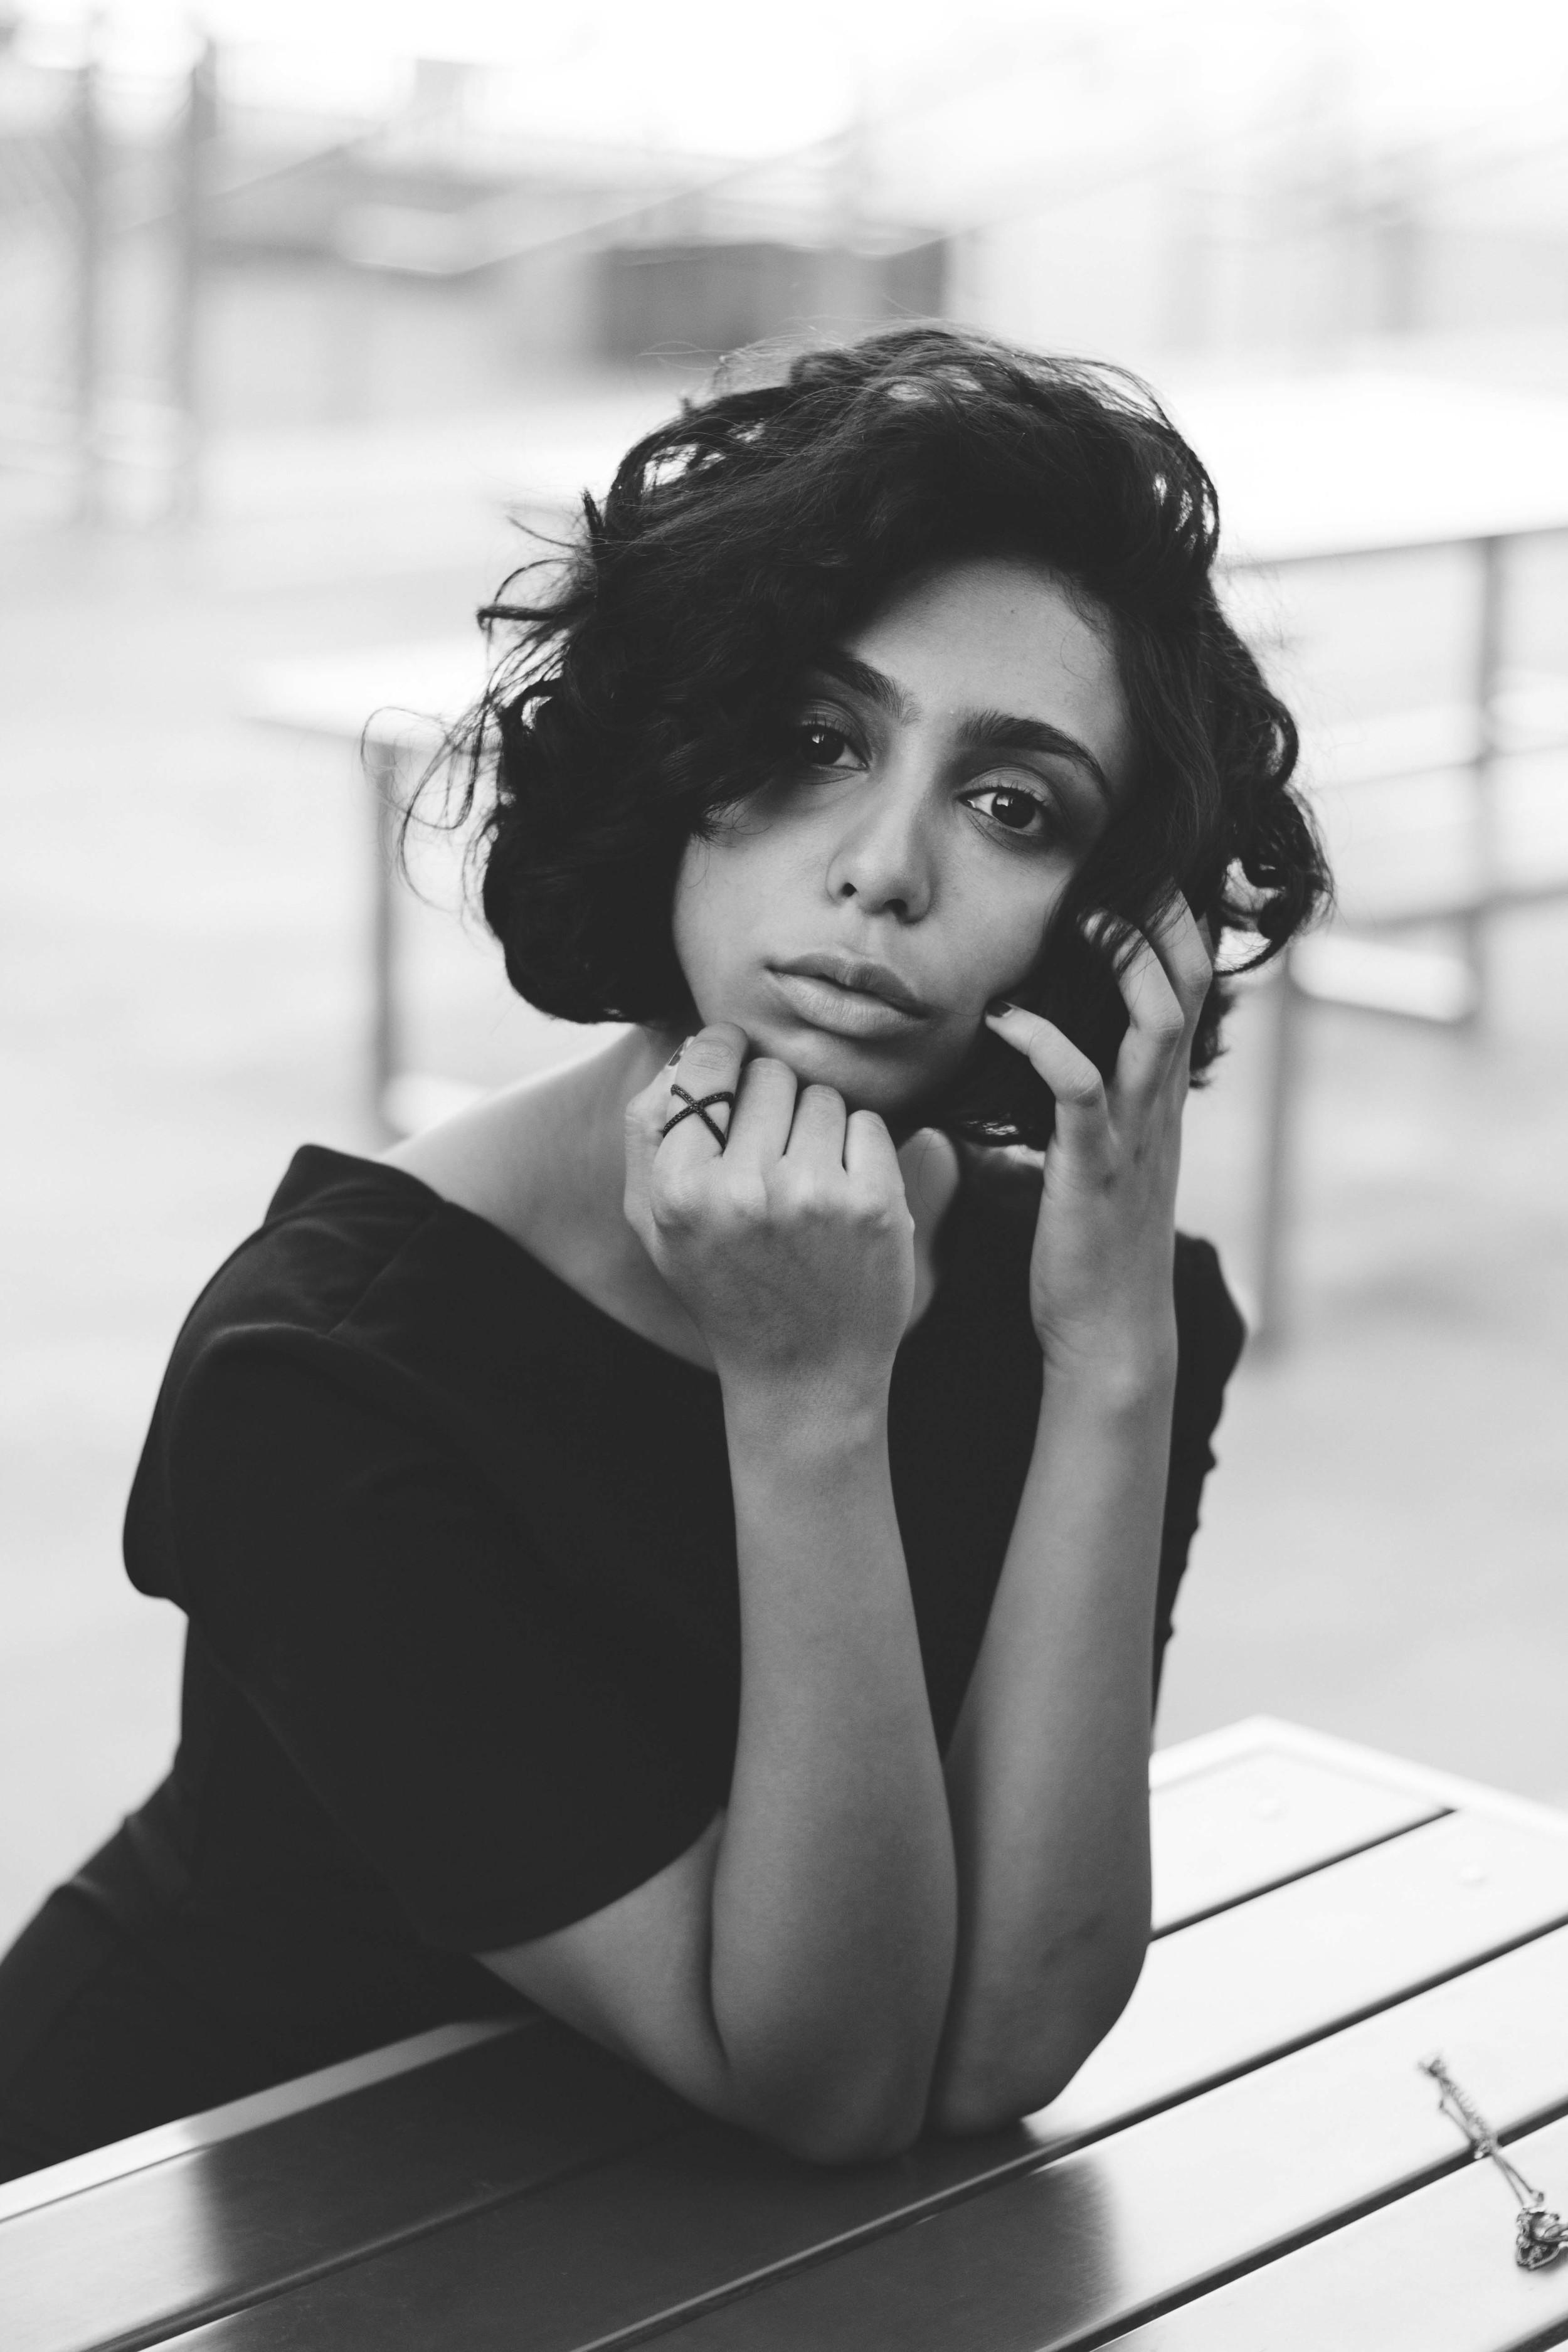 lincoln center portrait photography shooting model black and white irra korrelak walksmilesnap muriha qidwai 1.jpg